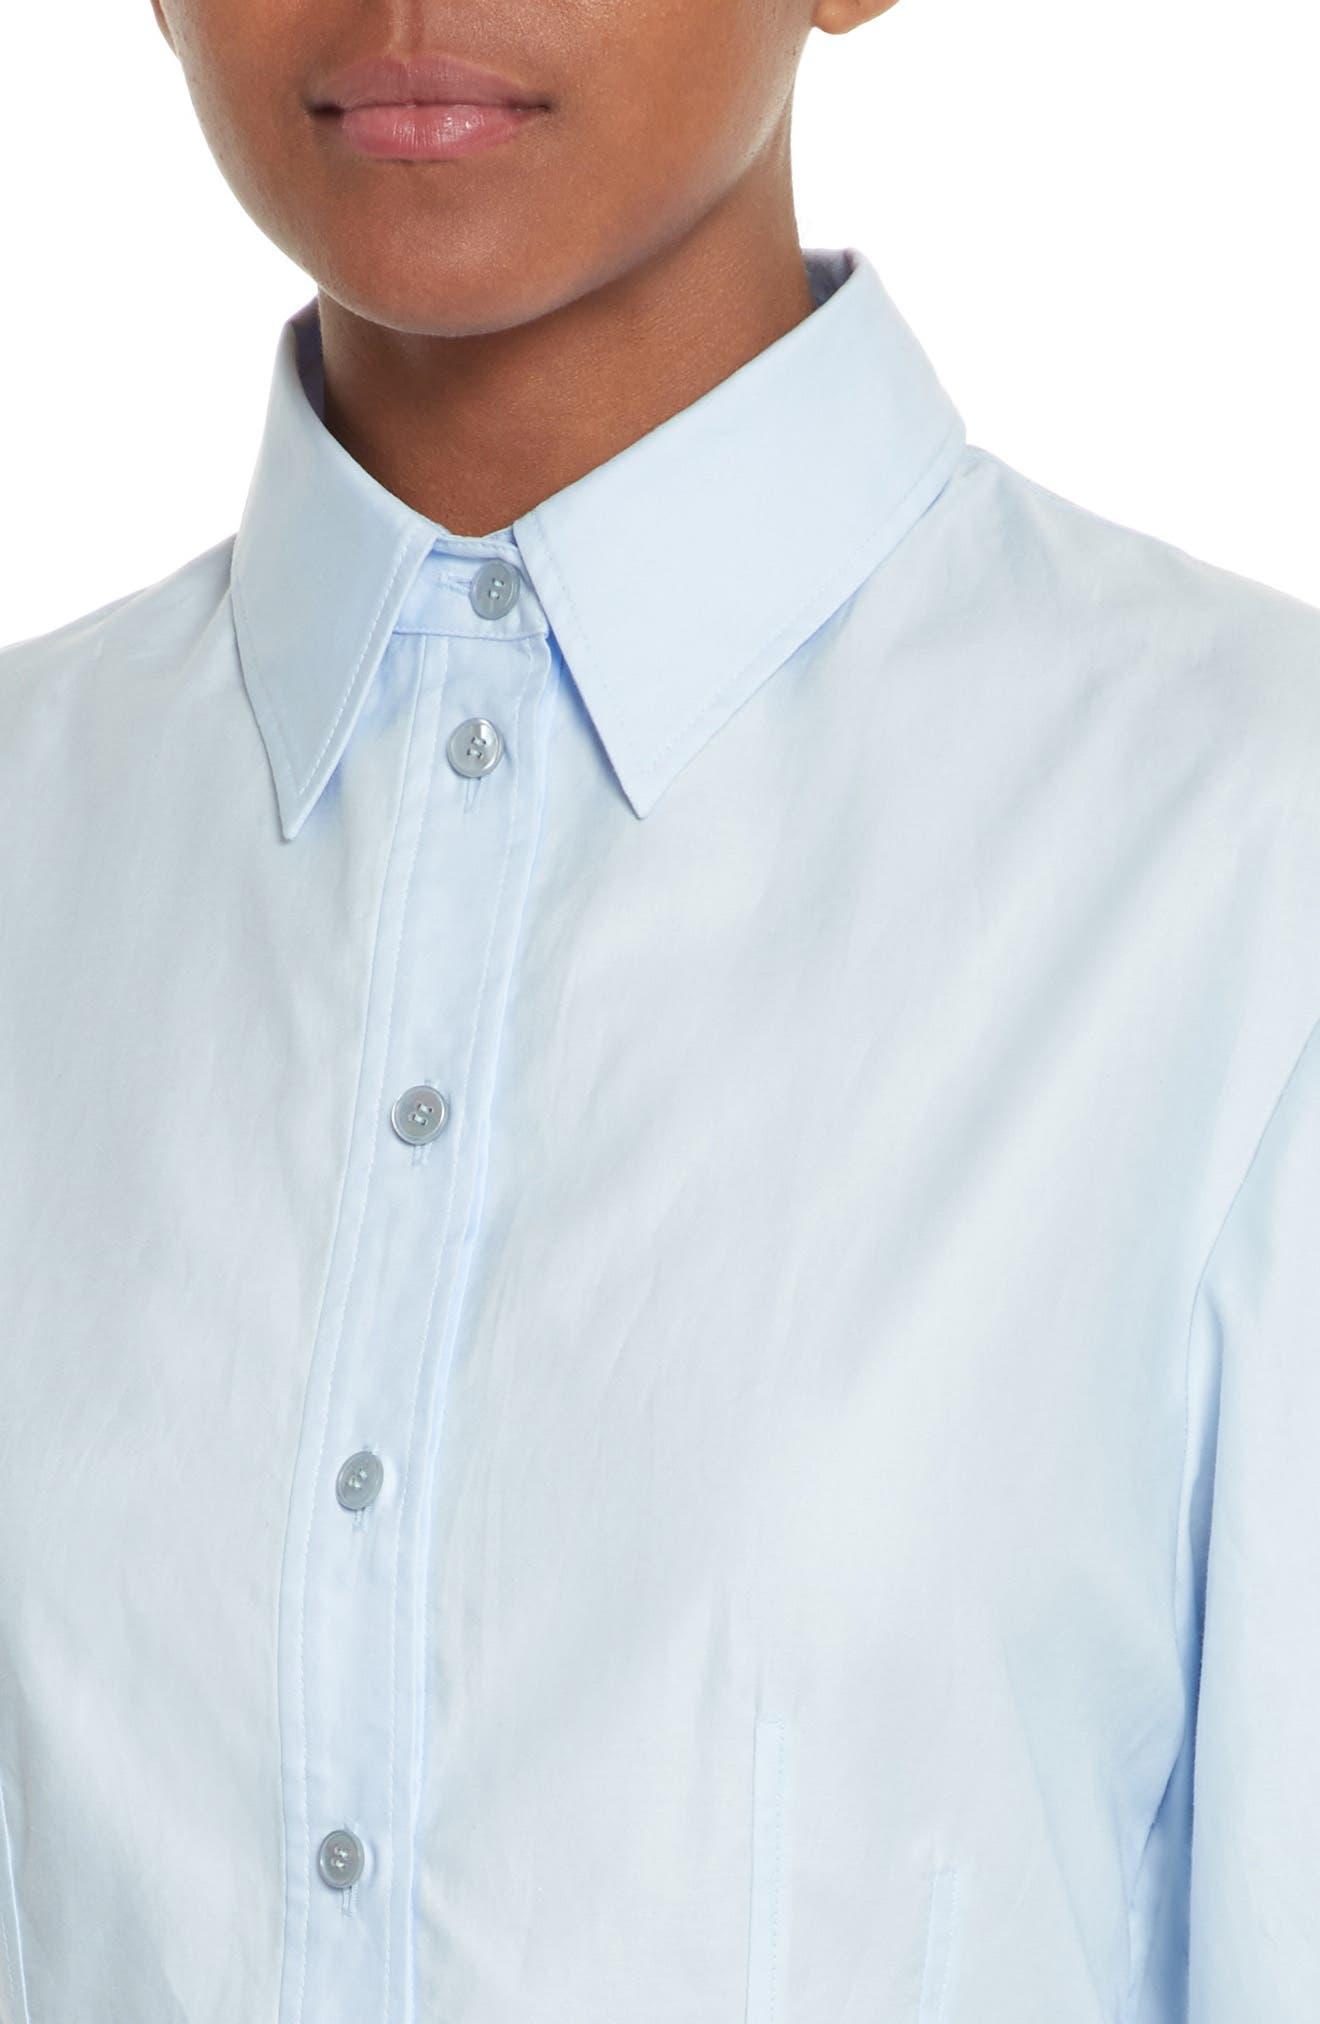 Carina Cotton Poplin Shirtdress,                             Alternate thumbnail 4, color,                             474